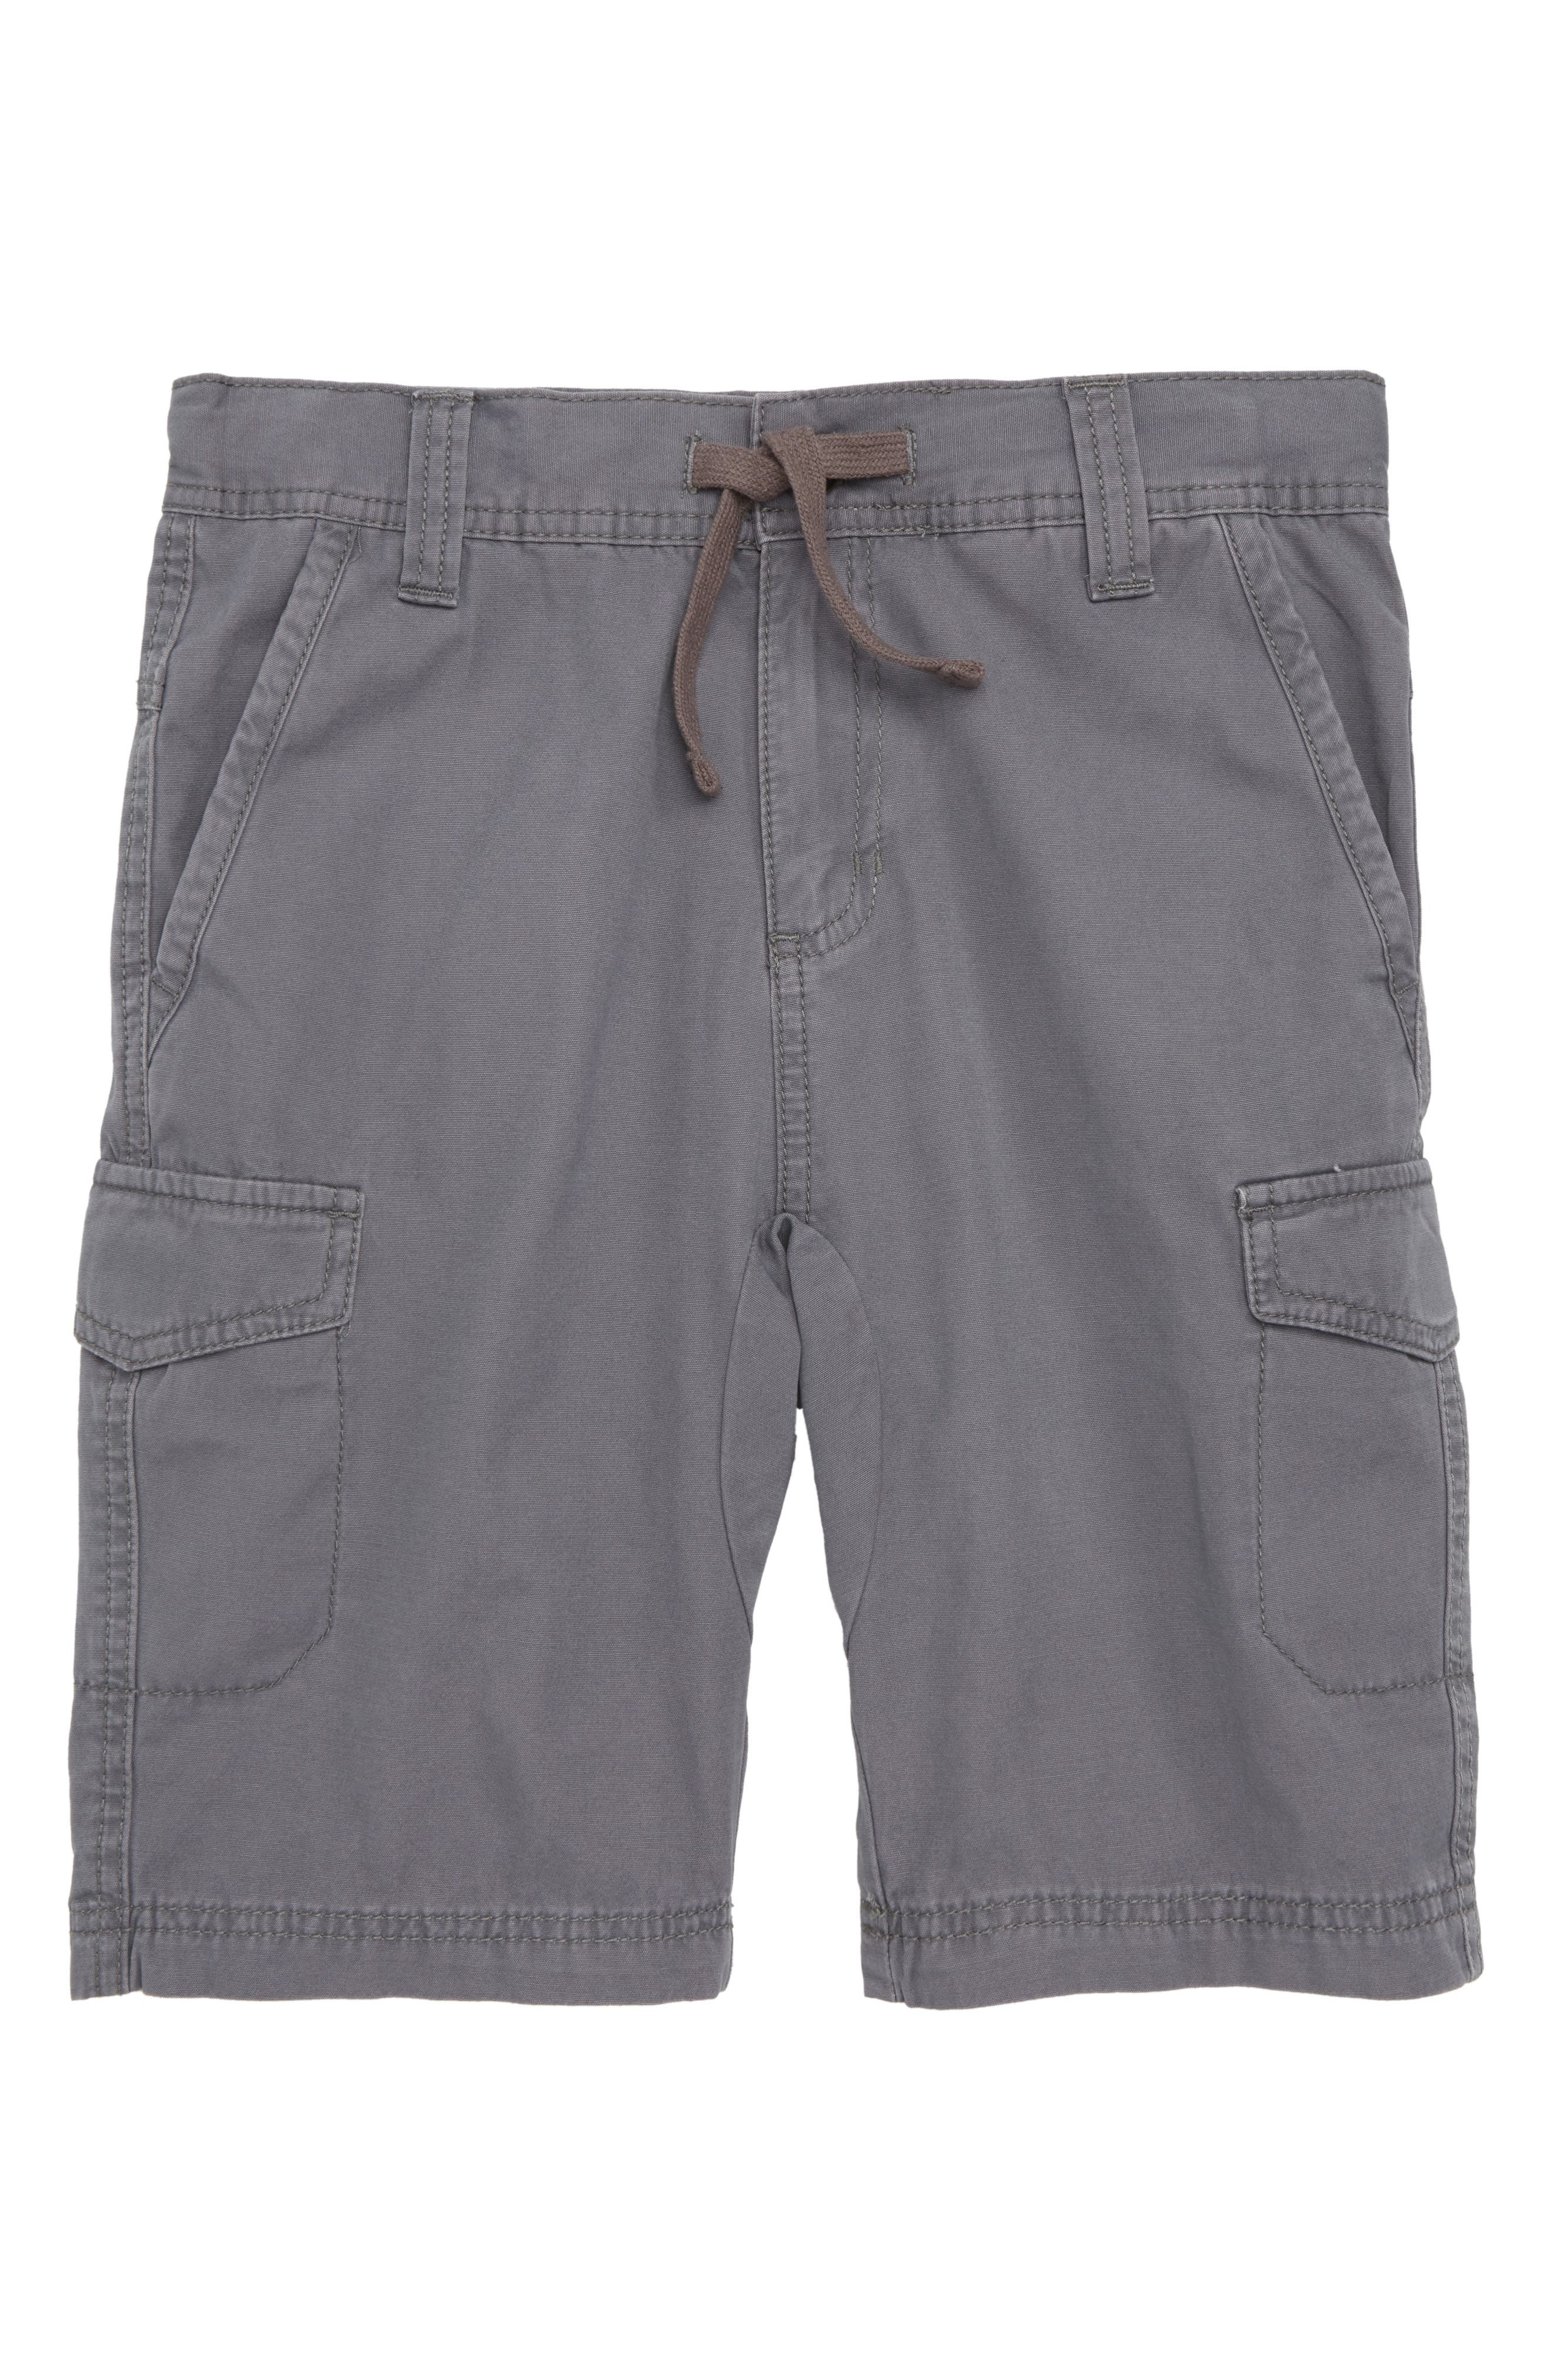 Utility Shorts,                             Main thumbnail 1, color,                             Grey Castlerock